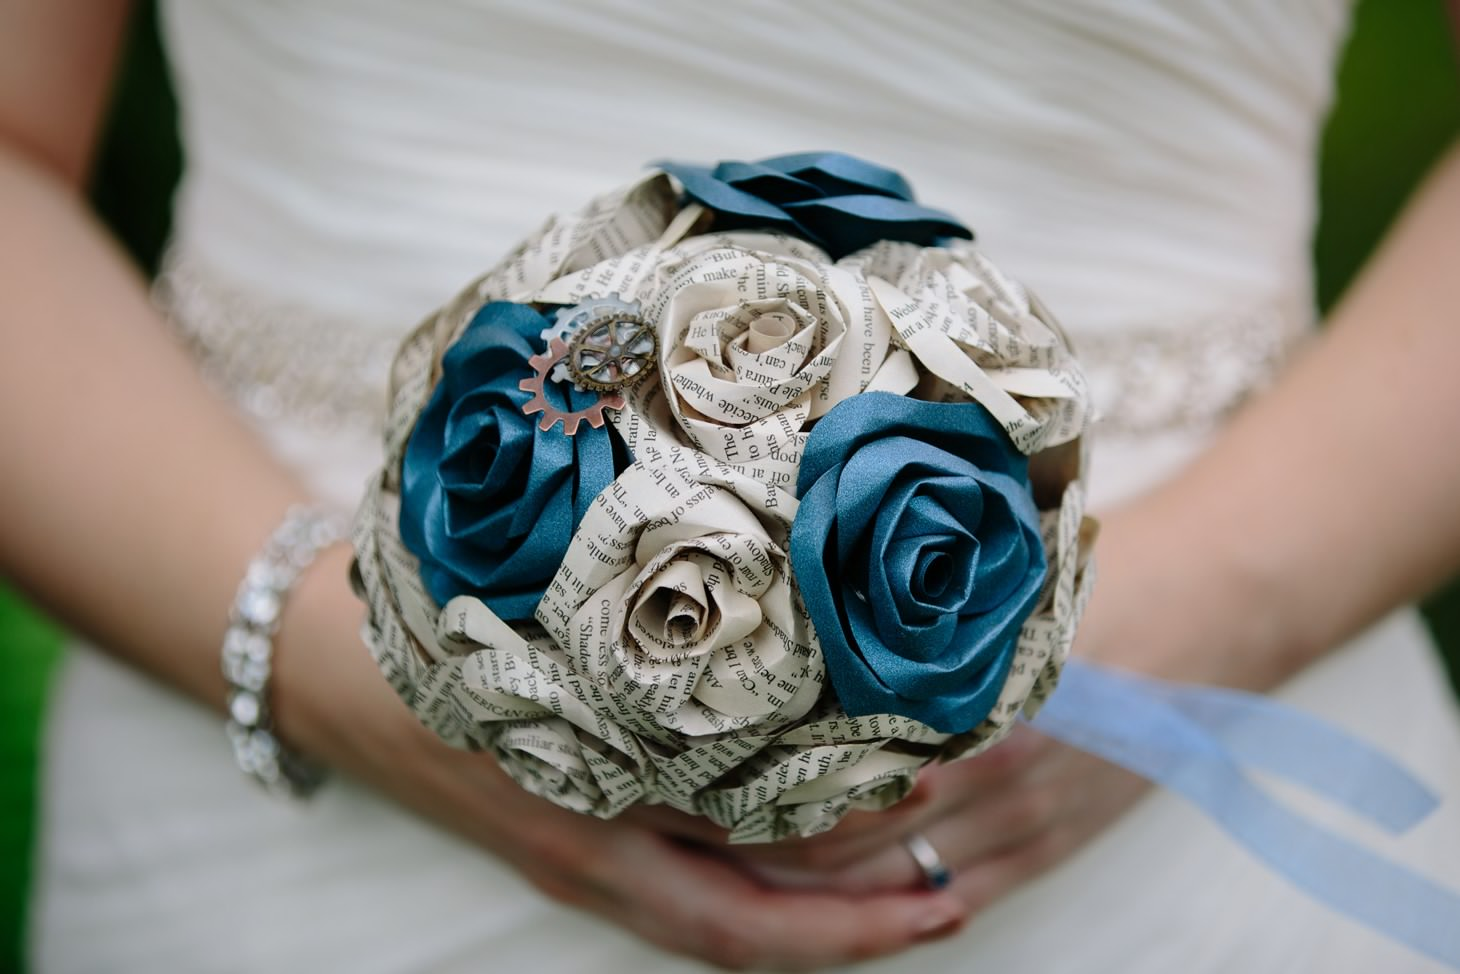 023-nyc-wedding-photographer-nj-nerdy-dr-who-firehouse-wedding-smitten-chickens.jpg